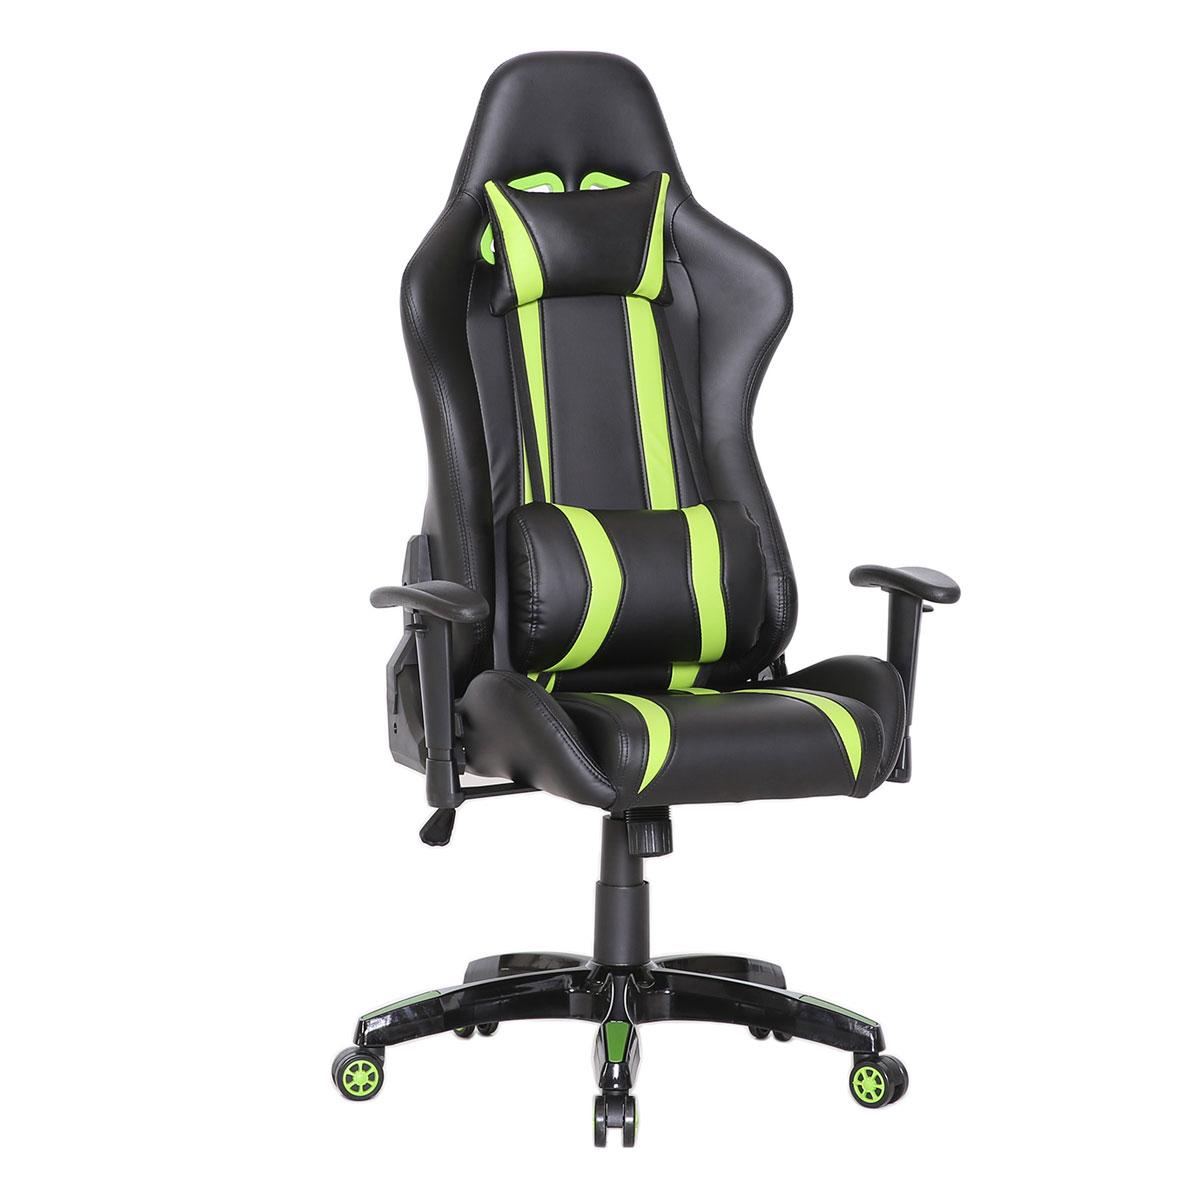 90208 Gaming Sessel Schwarz grün